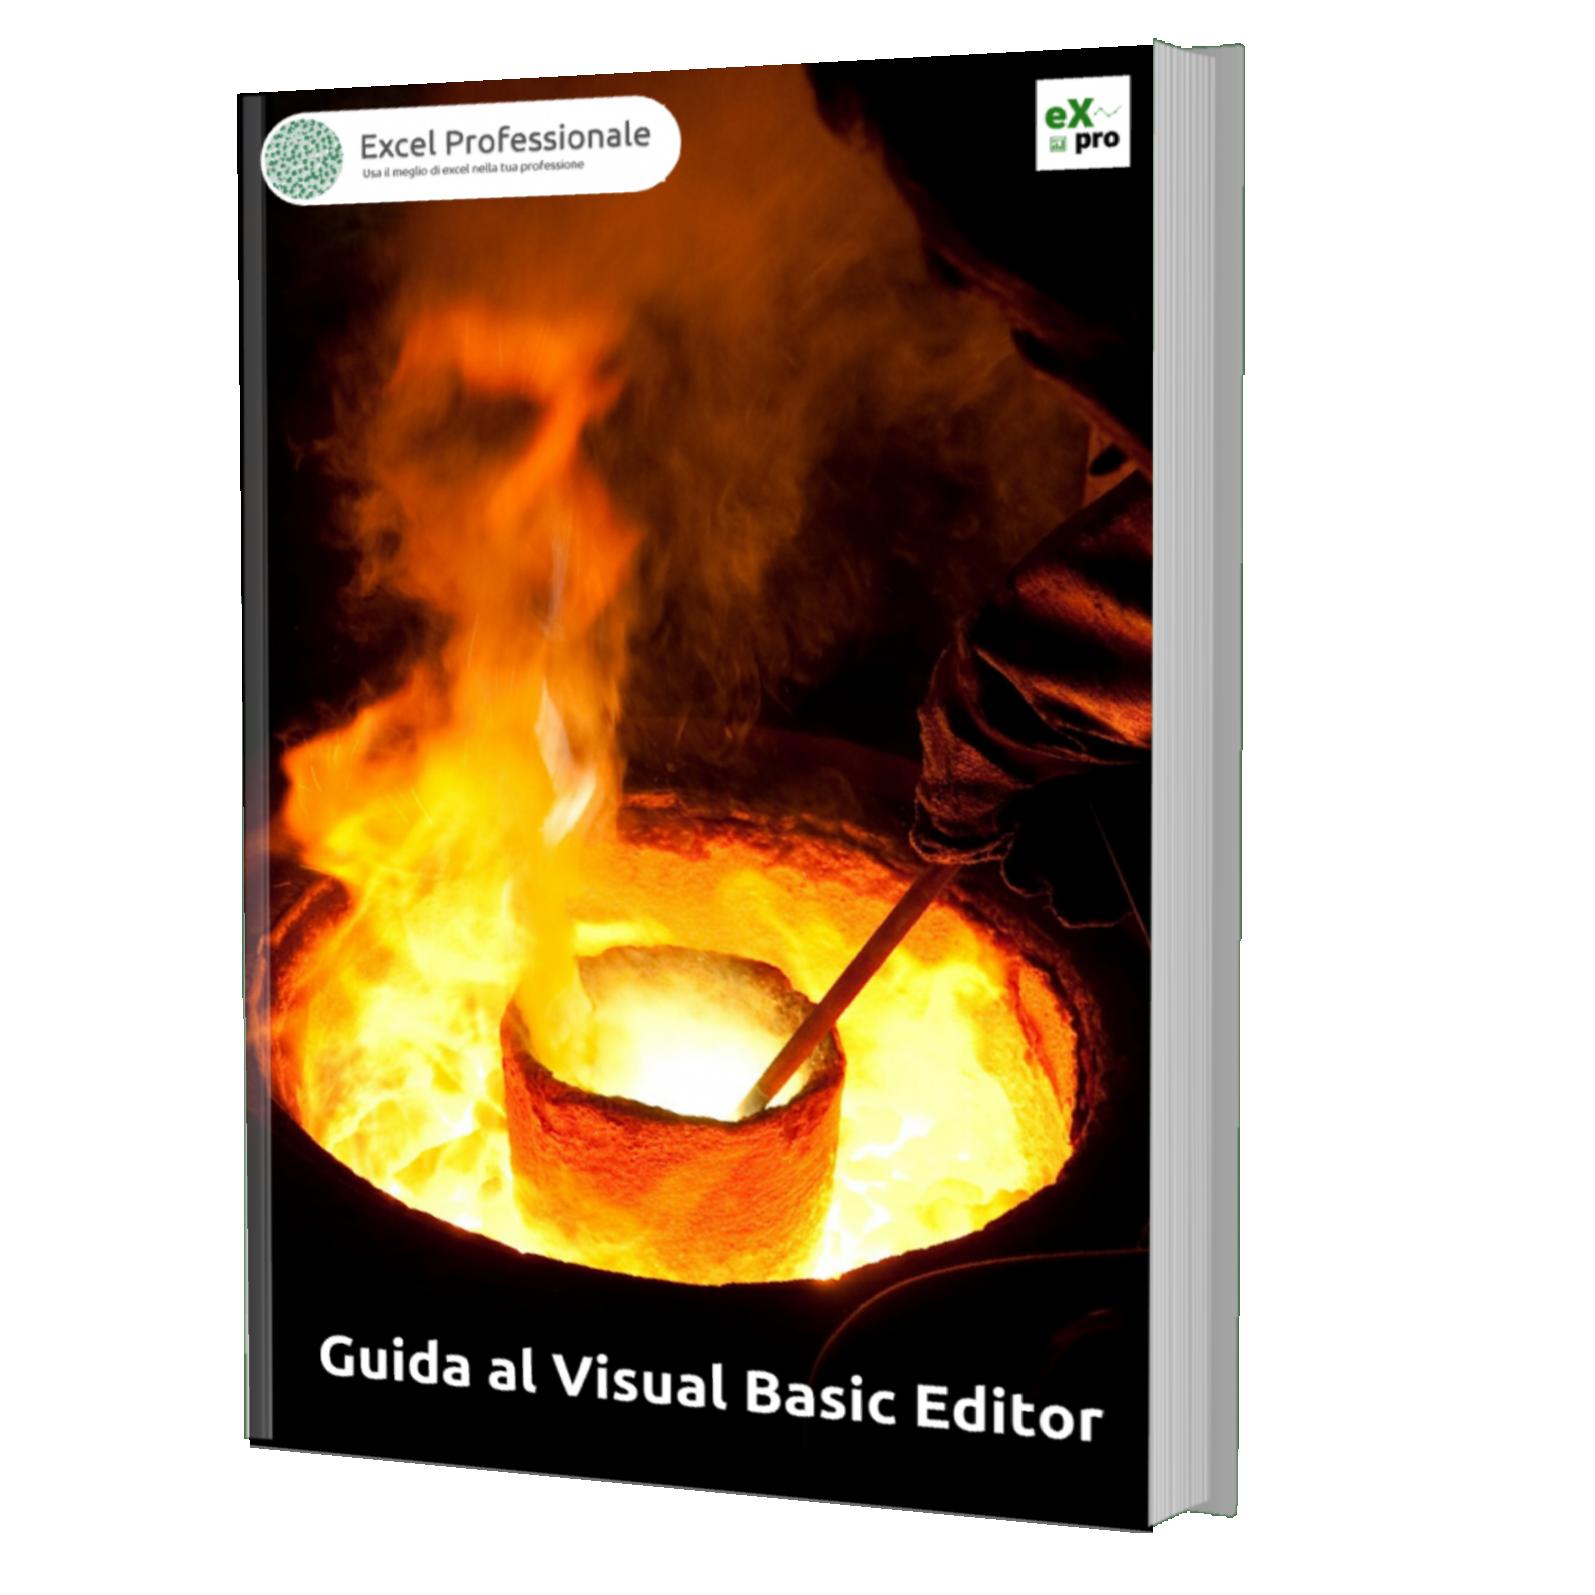 Guida al Visual Basic Editor